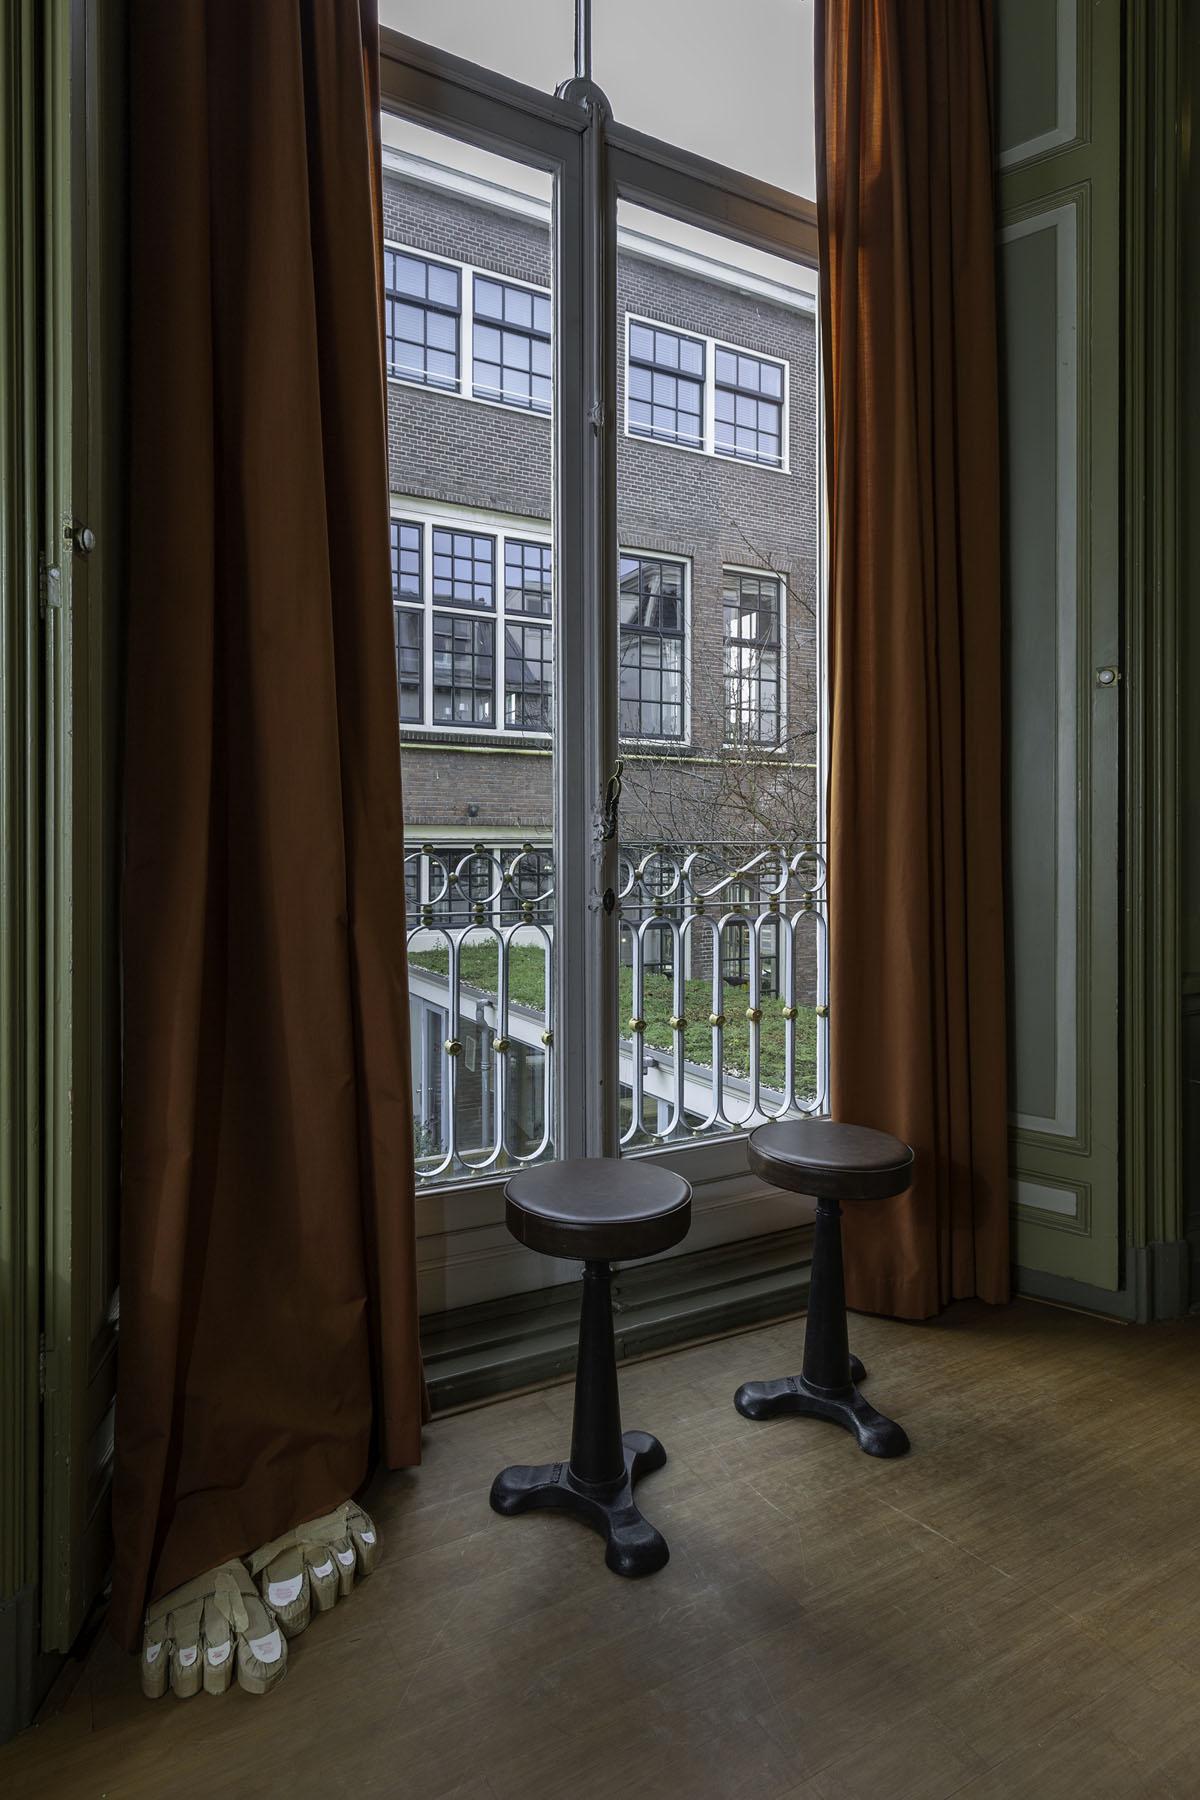 Freedom-Lab-Amsterdam-Jeroen-Machielsen-15.jpg